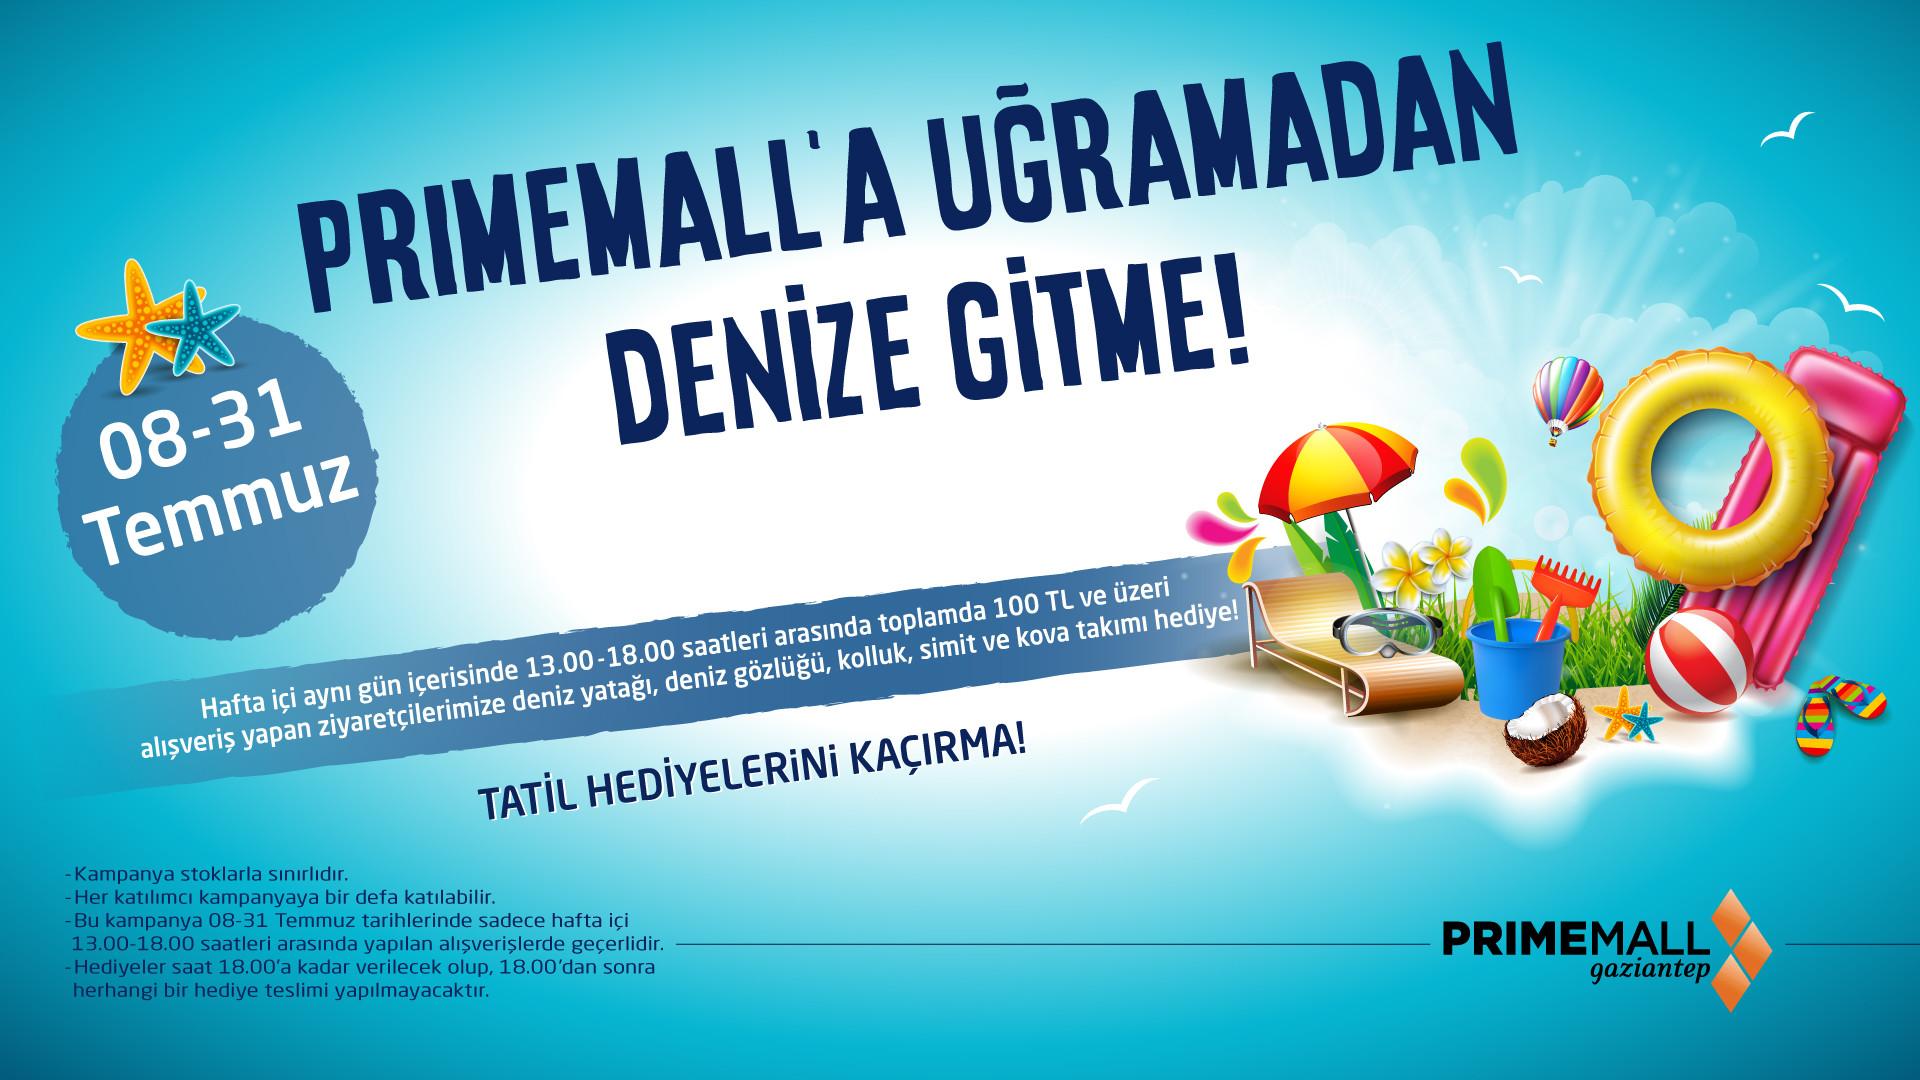 Primemall'a Uğramadan Denize Gitme!